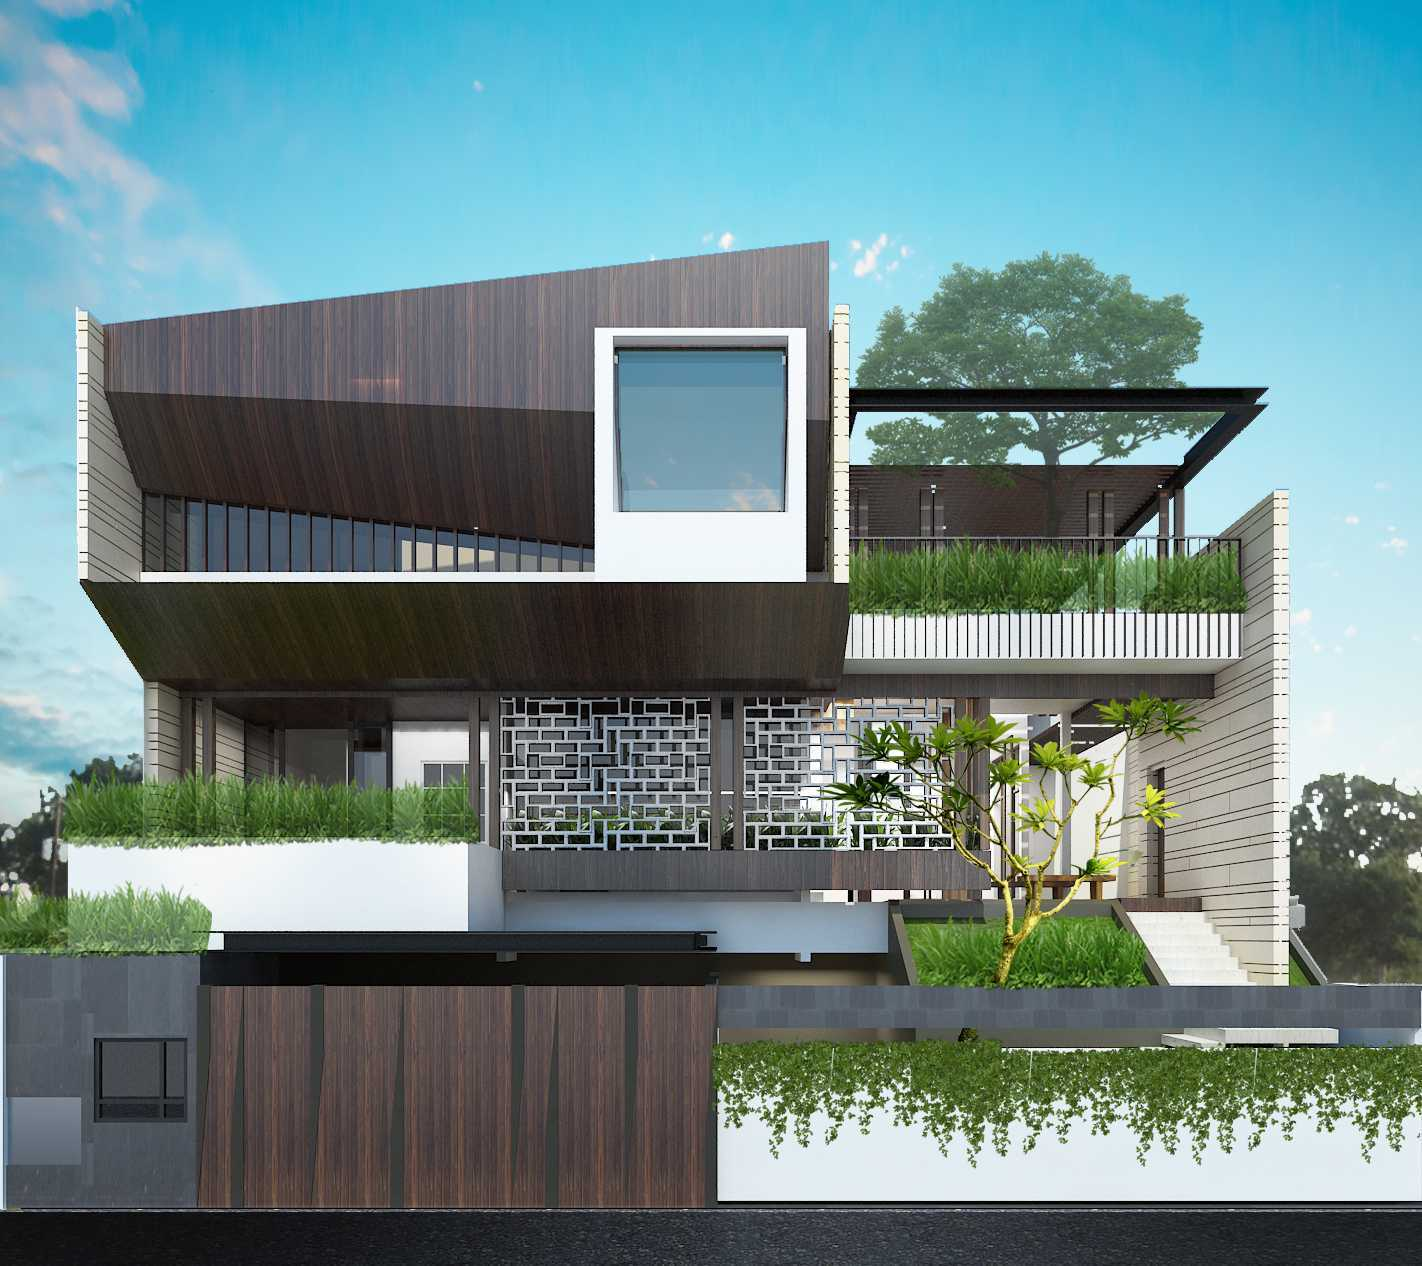 Pt Alradista Desain Indonesia Sa House Bandung City, West Java, Indonesia Bandung City, West Java, Indonesia Alradistadesign-Sa-House  50511